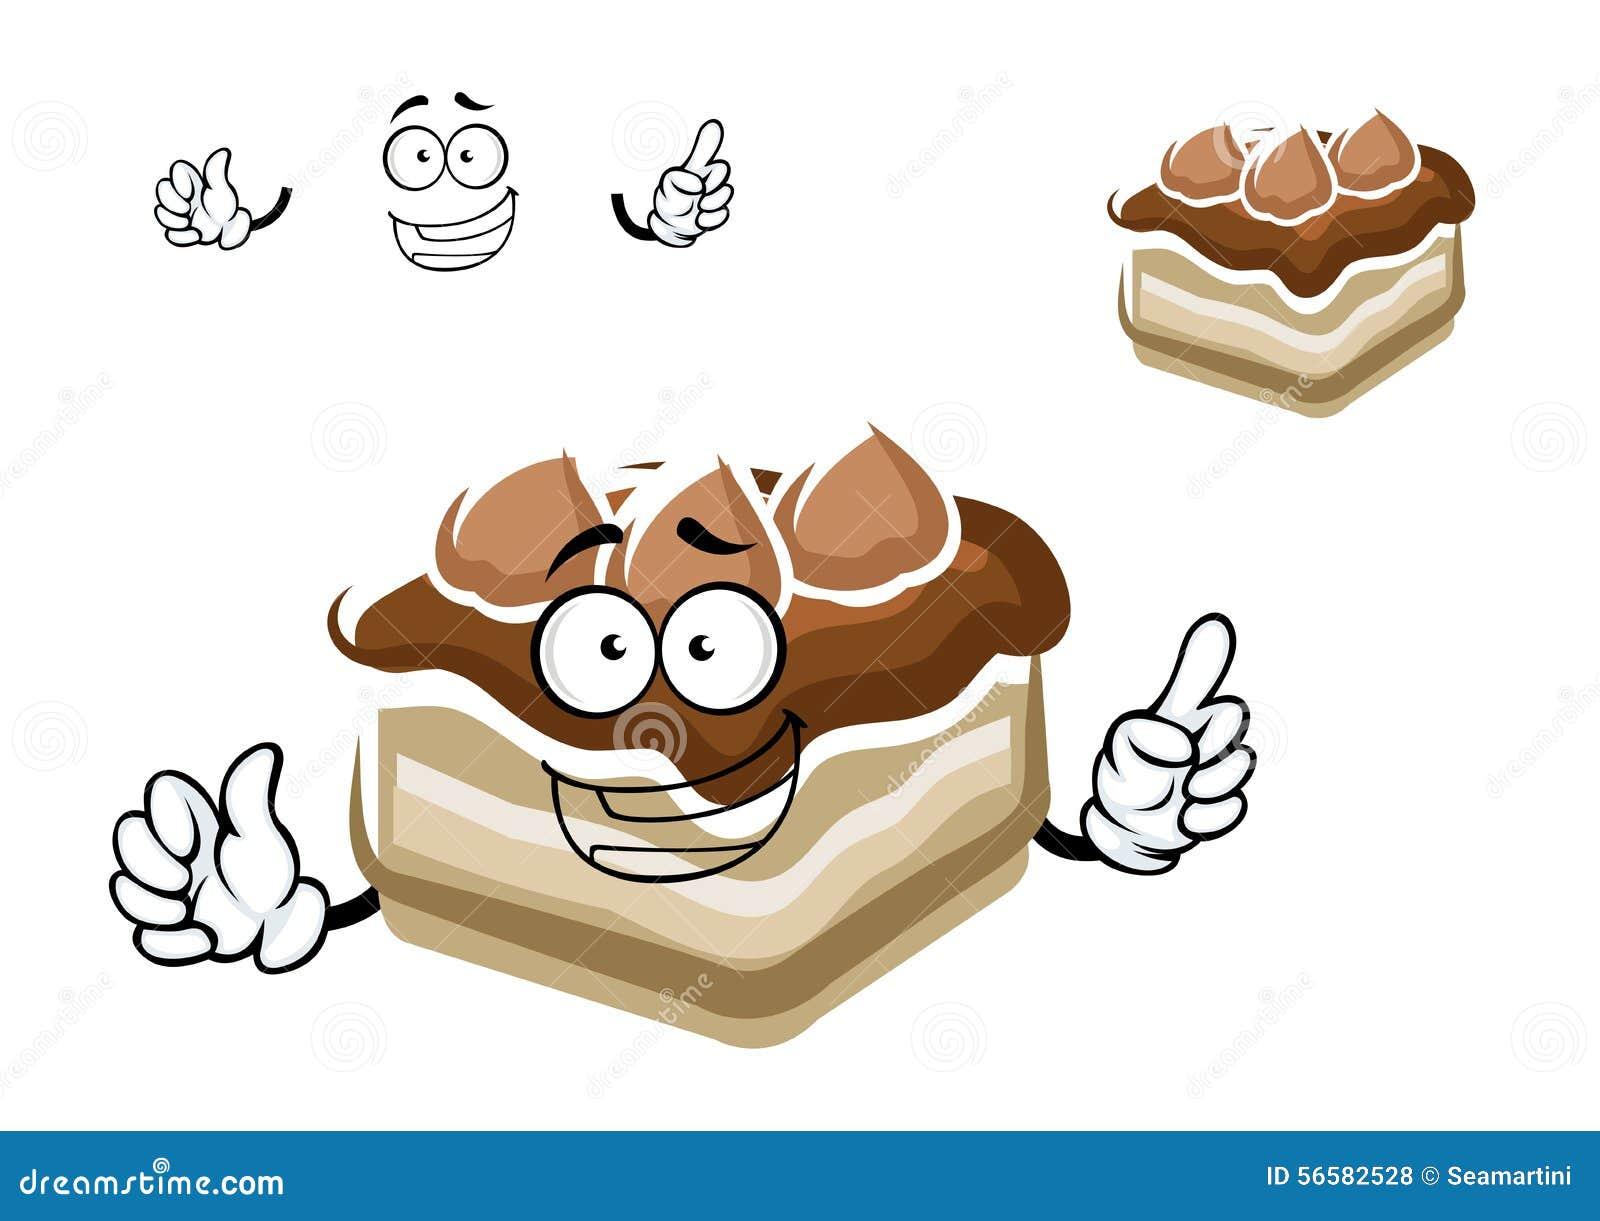 Cake Slice Cartoon Images : Cartoon Slice Of Chocolate Cake Stock Vector - Image: 56582528